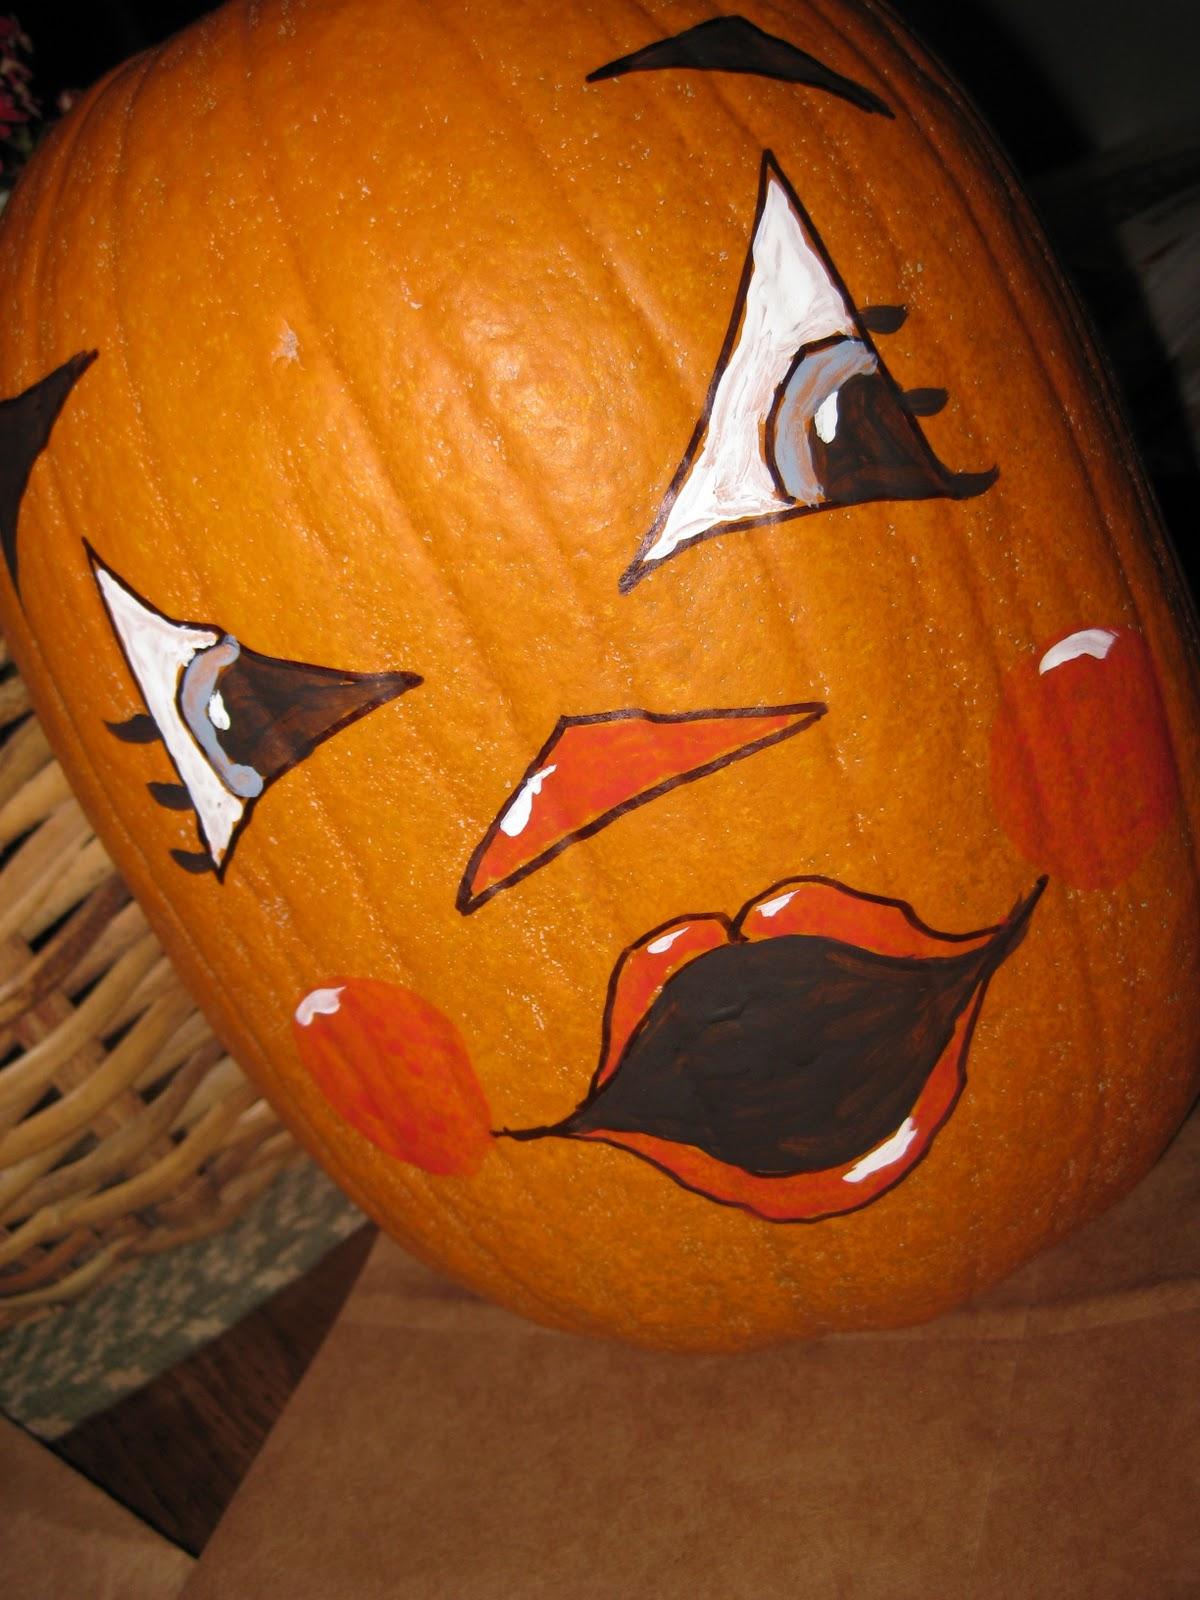 Bits & Pieces, This & That: Painted Pumpkin Faces